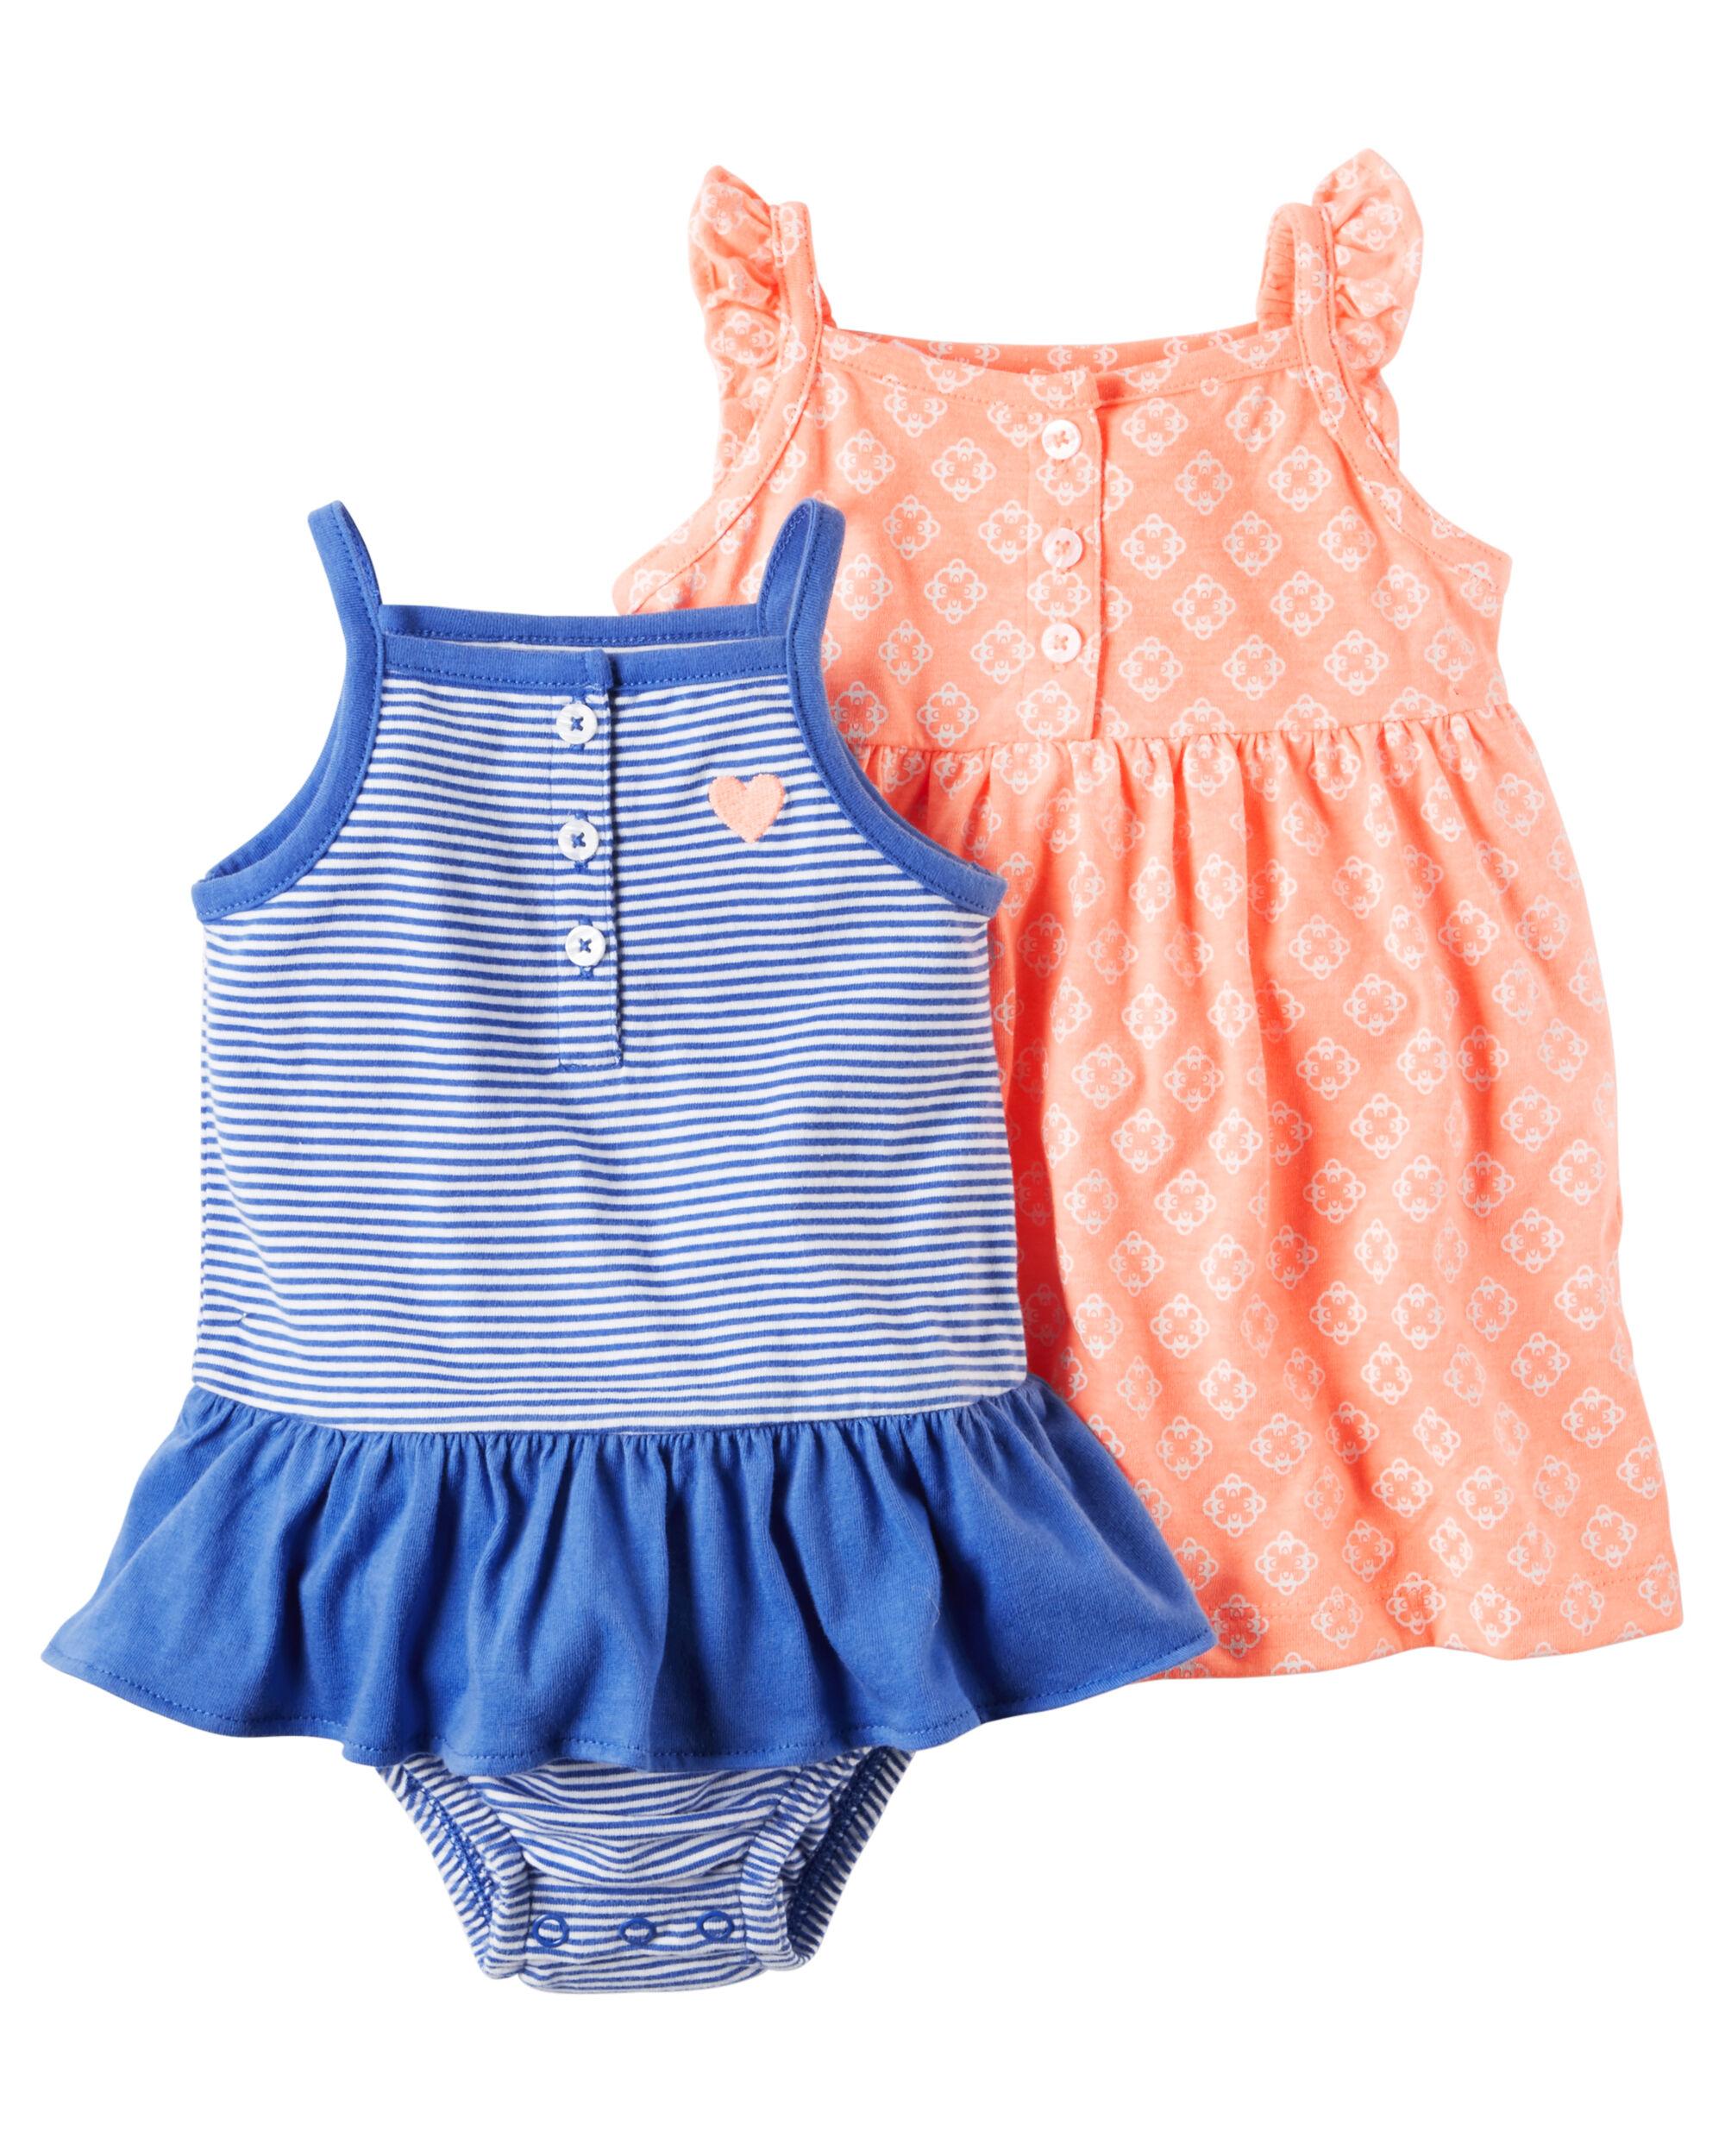 Baby Girl 2 Pack Neon Dress & Sunsuit Set